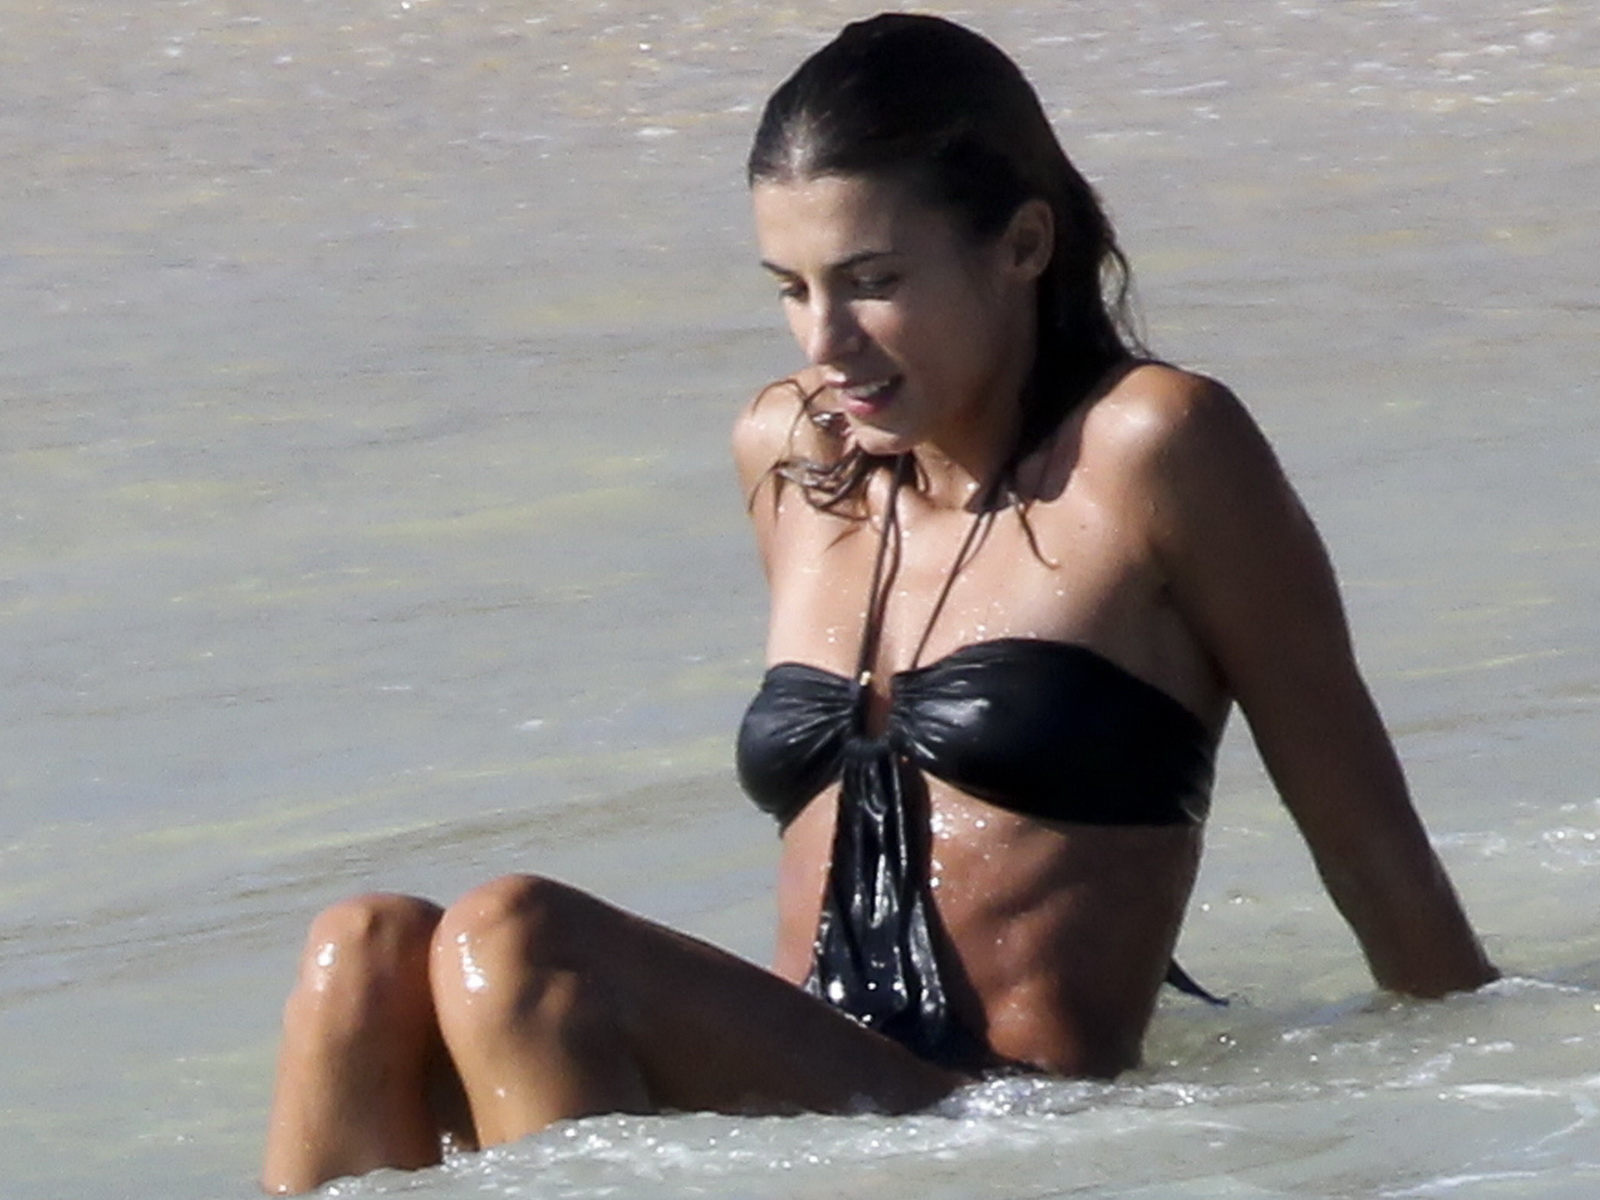 http://4.bp.blogspot.com/_NRGPIrDtEg8/TSMmFtY5MpI/AAAAAAAAAmY/fJXFKCZ7CjI/s1600/Elisabetta_Canalis_swimsuit_arse_in+bikini_beach_candids_Mexico_1.jpg